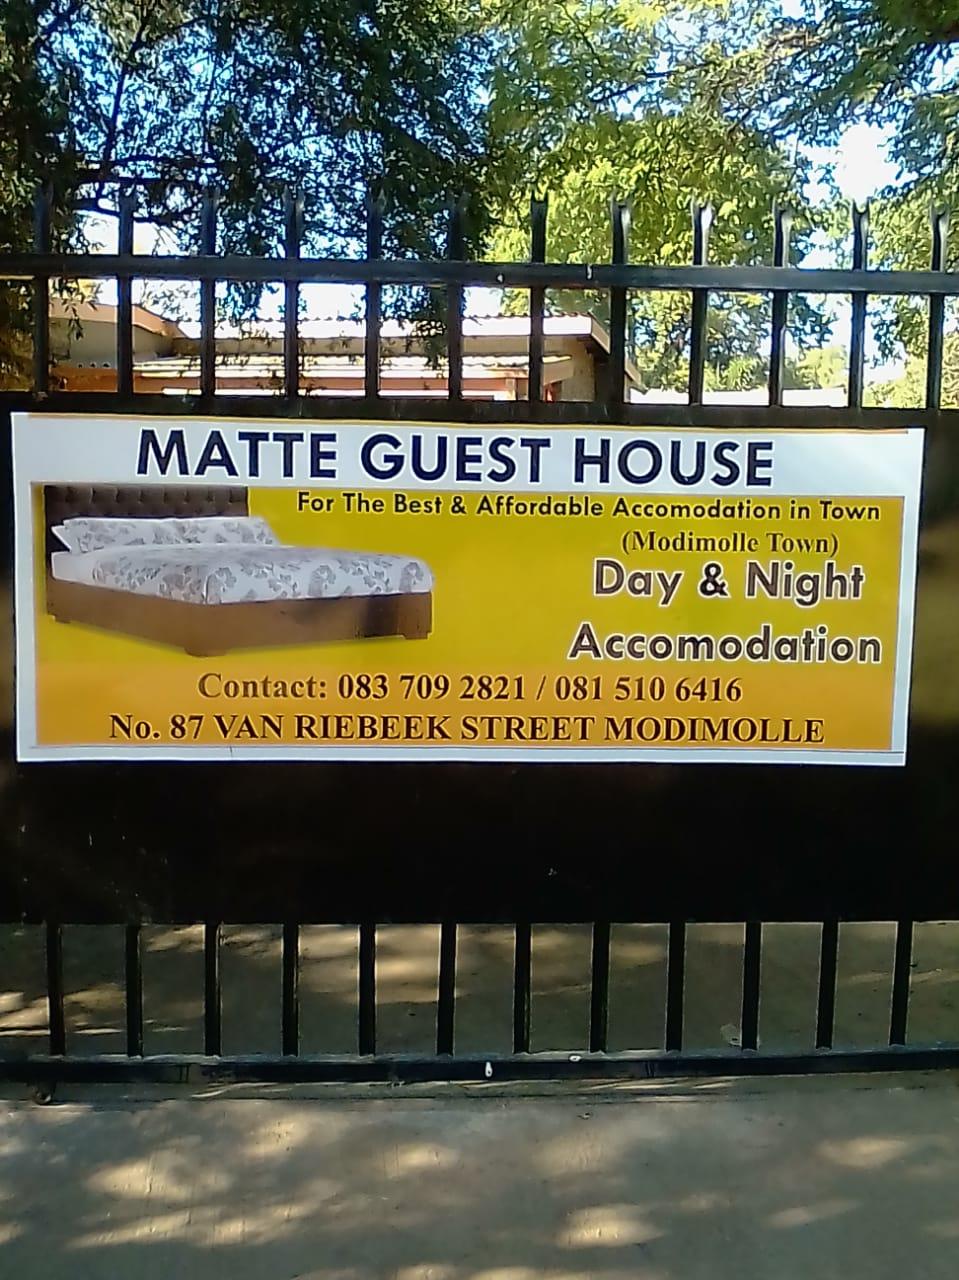 Temporary accommodation available